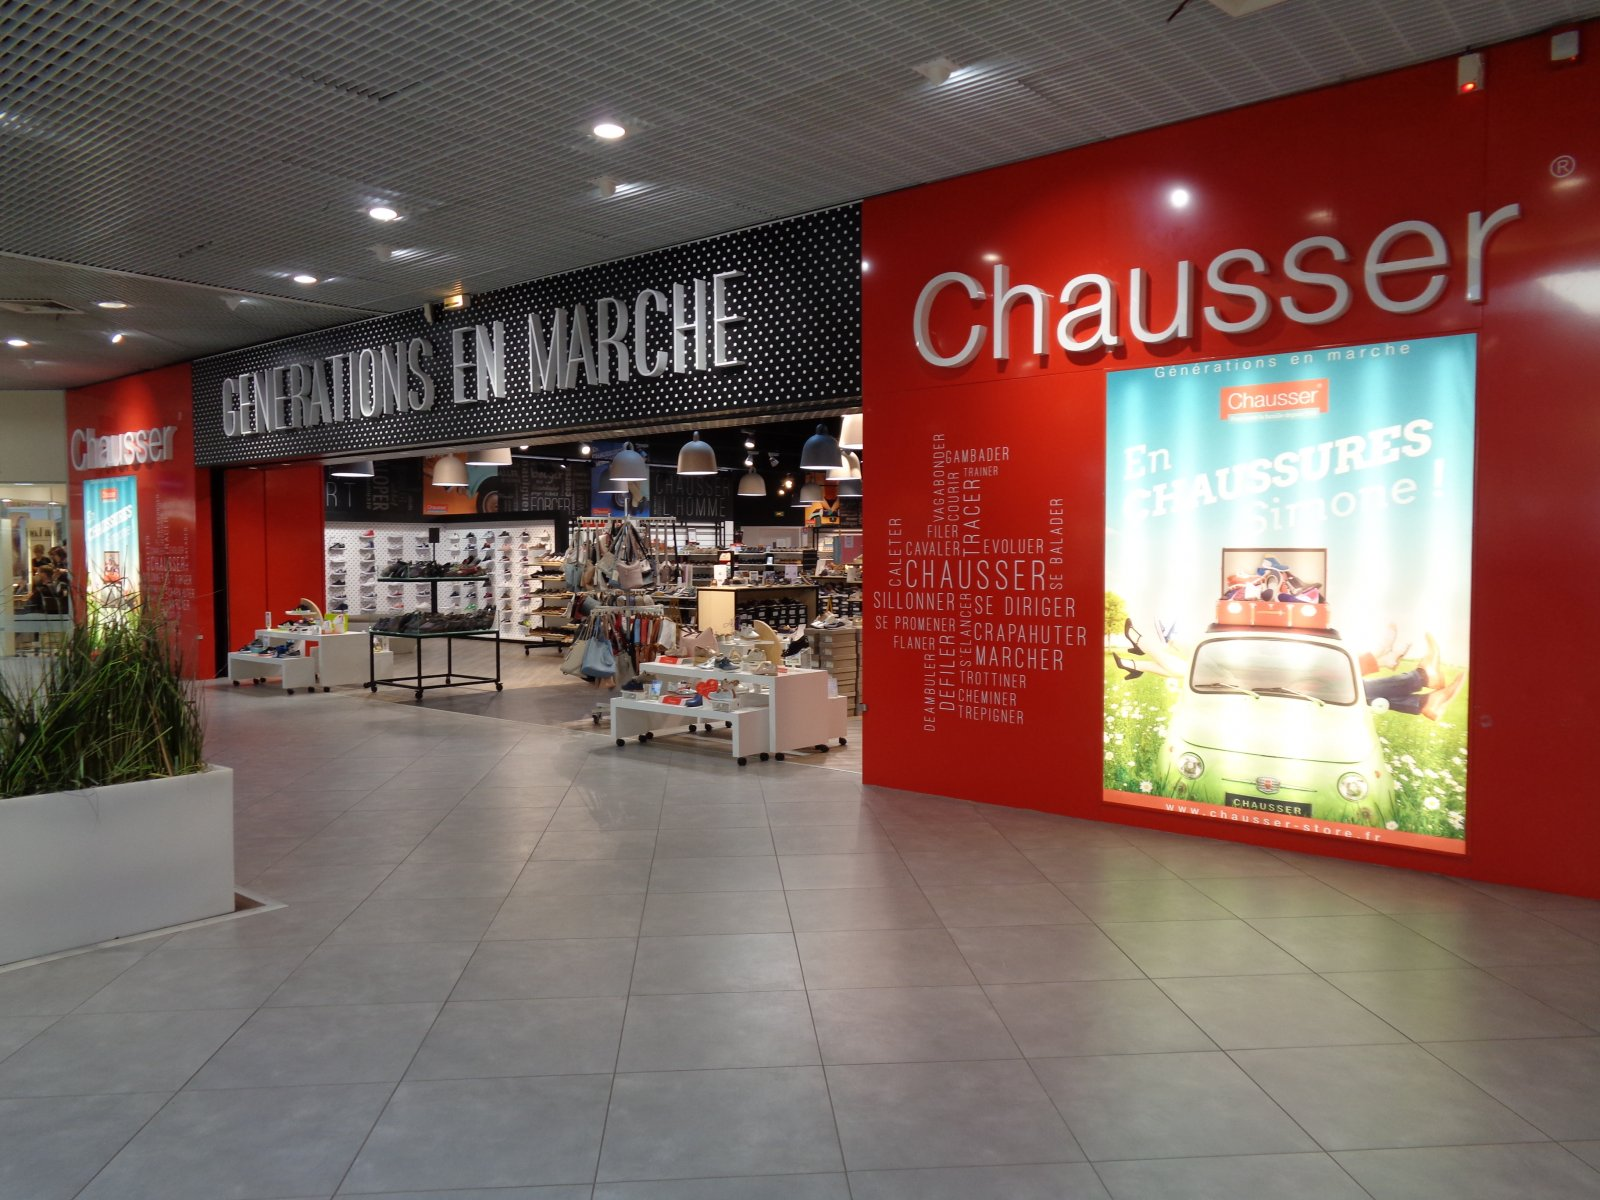 Chausser